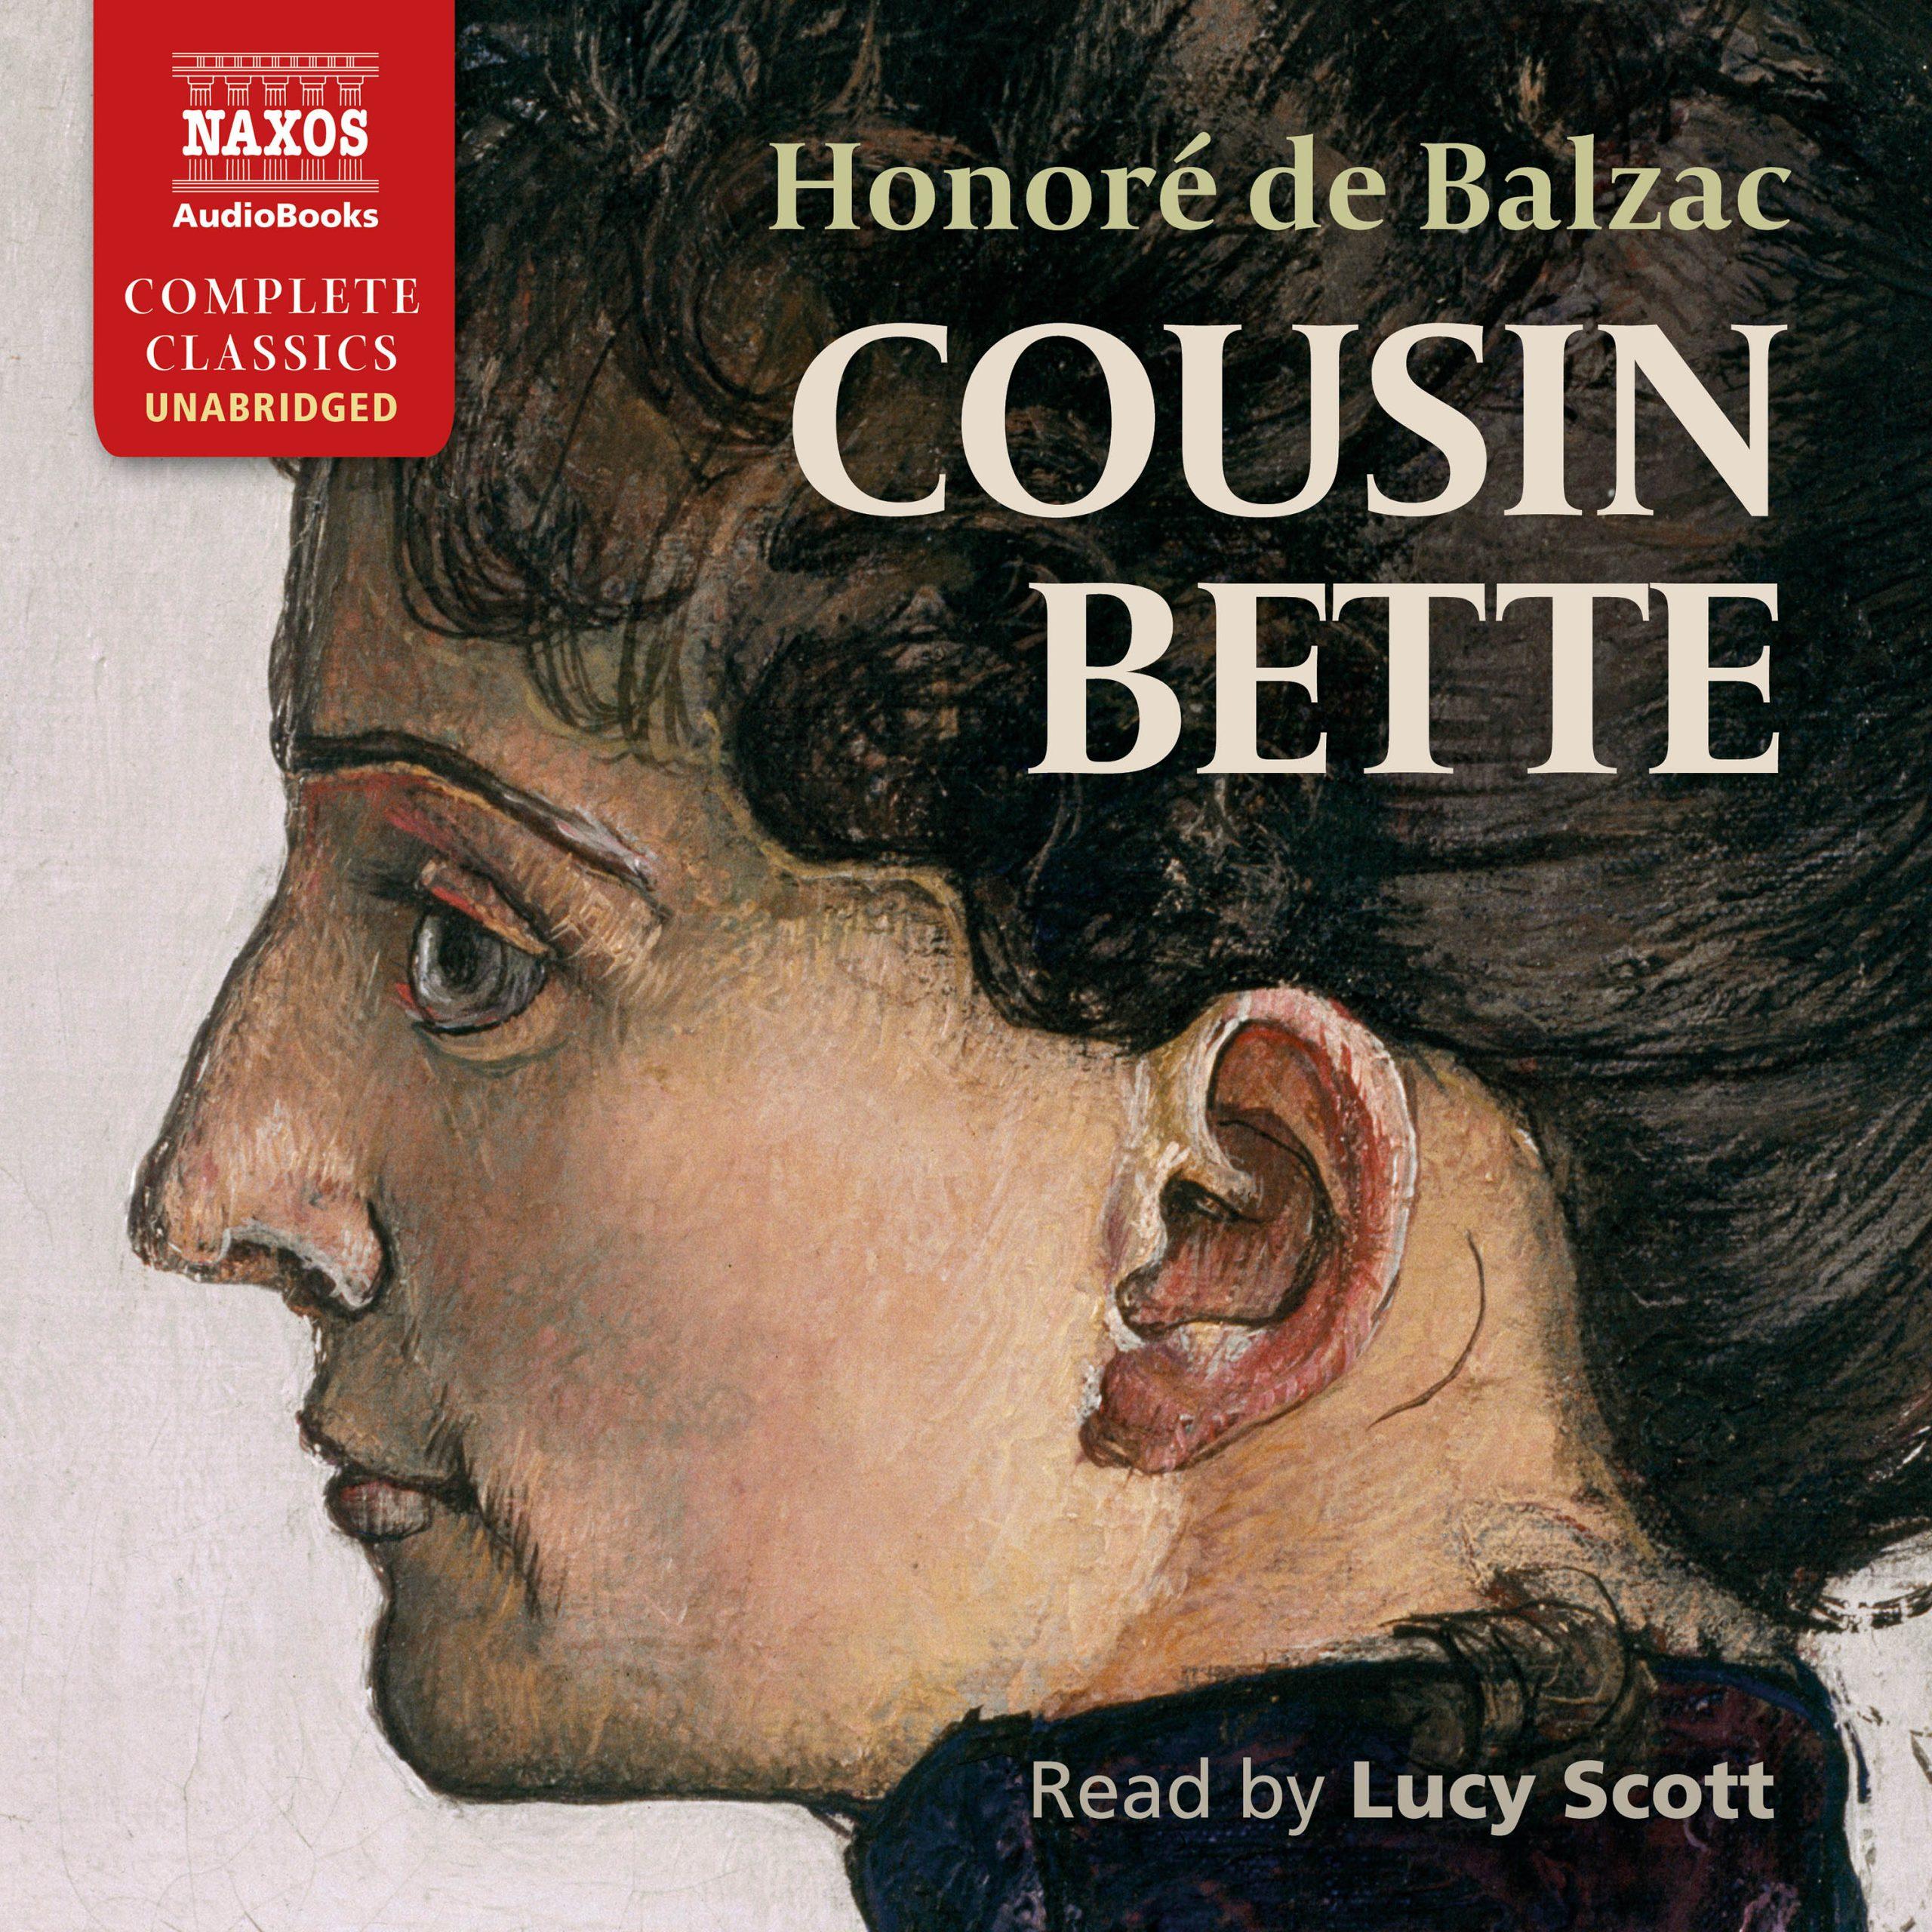 Cousin Bette (unabridged)